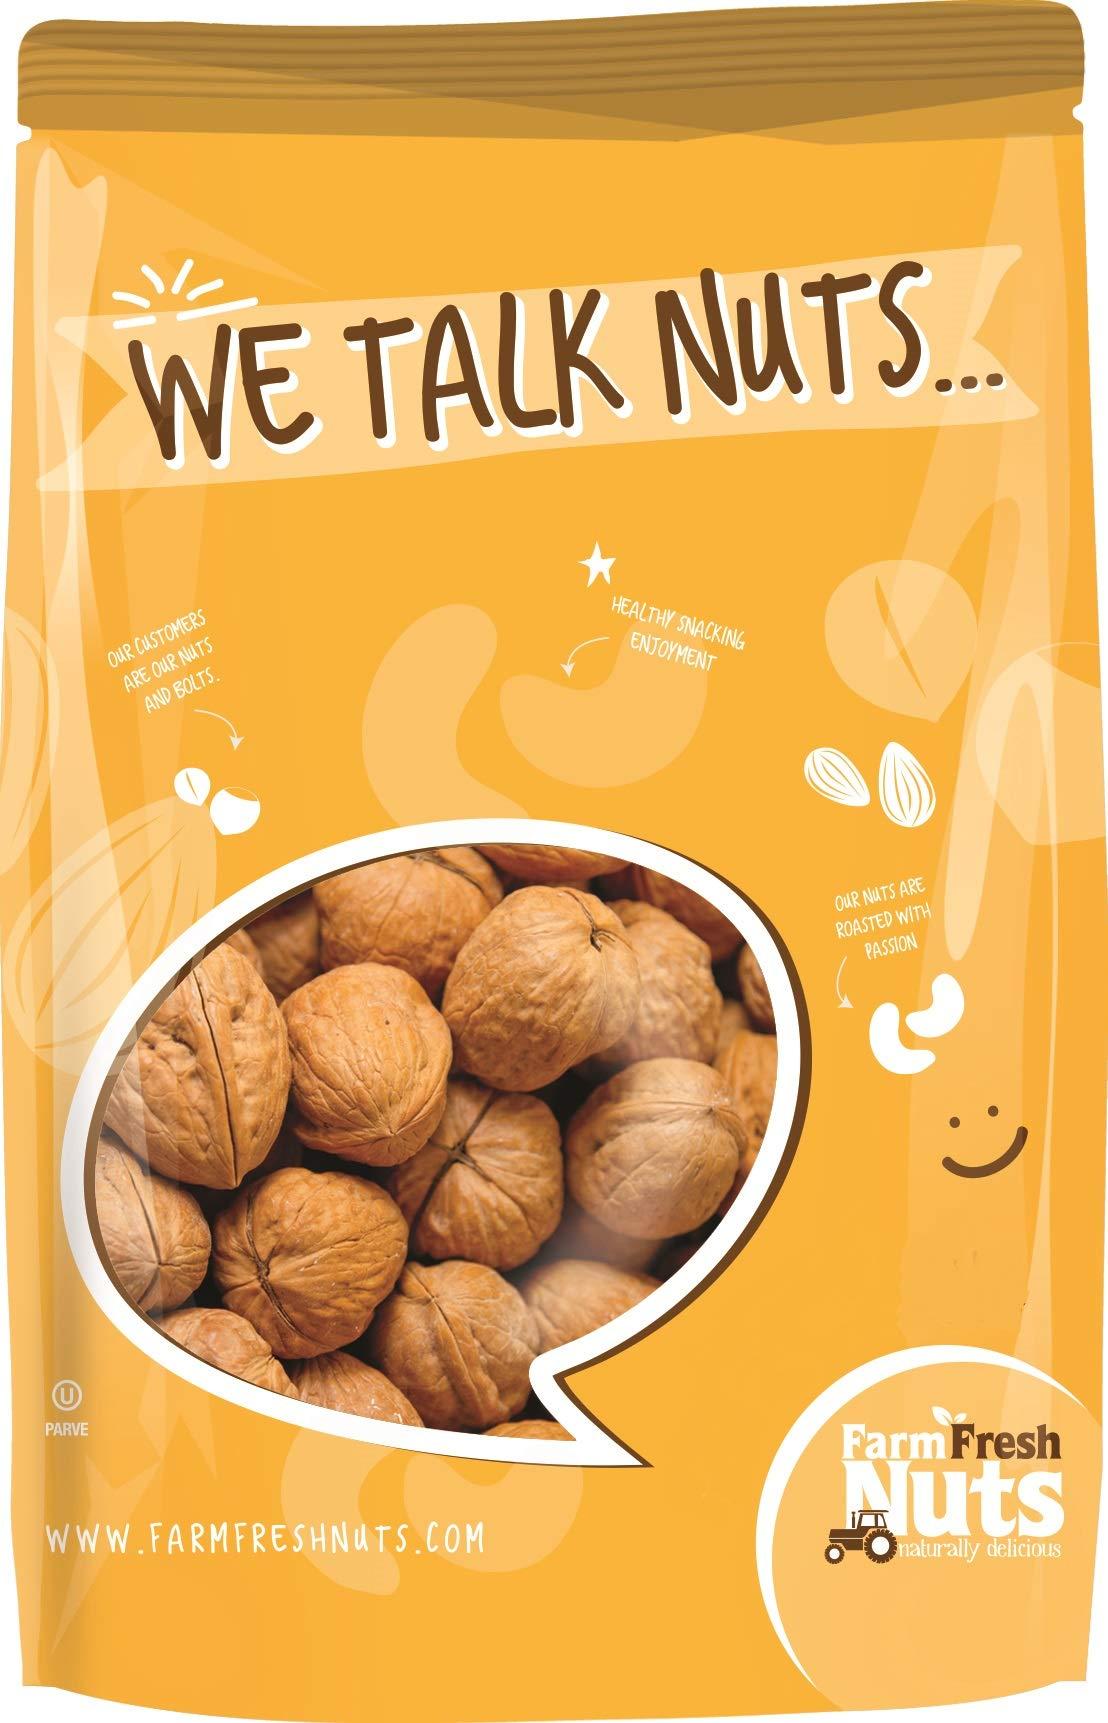 WALNUTS In Shell- JUMBO Natural California Walnuts- Great Source of Omega 3 -!! FRESH NEW CROP !! (2 LB) by Farm Fresh Nuts